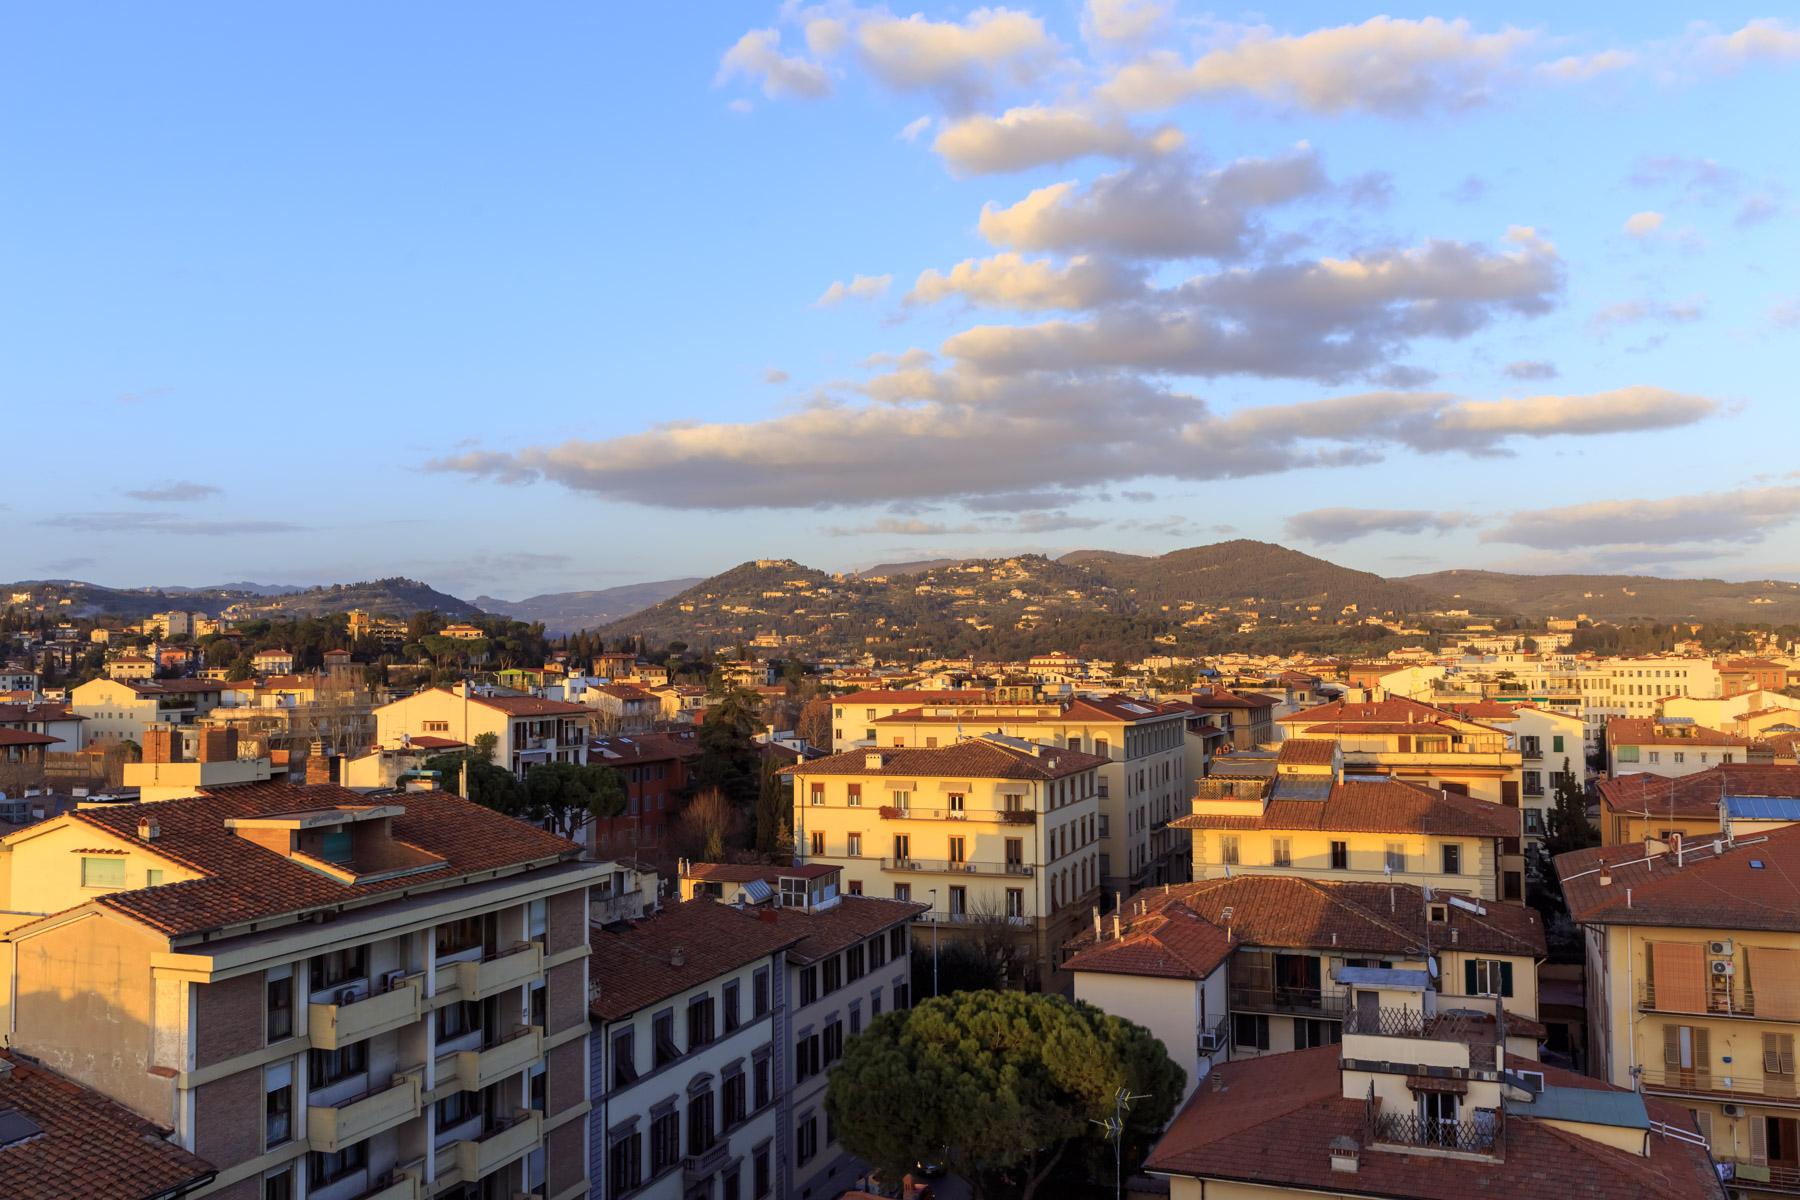 Attico in Vendita a Firenze: 5 locali, 250 mq - Foto 20